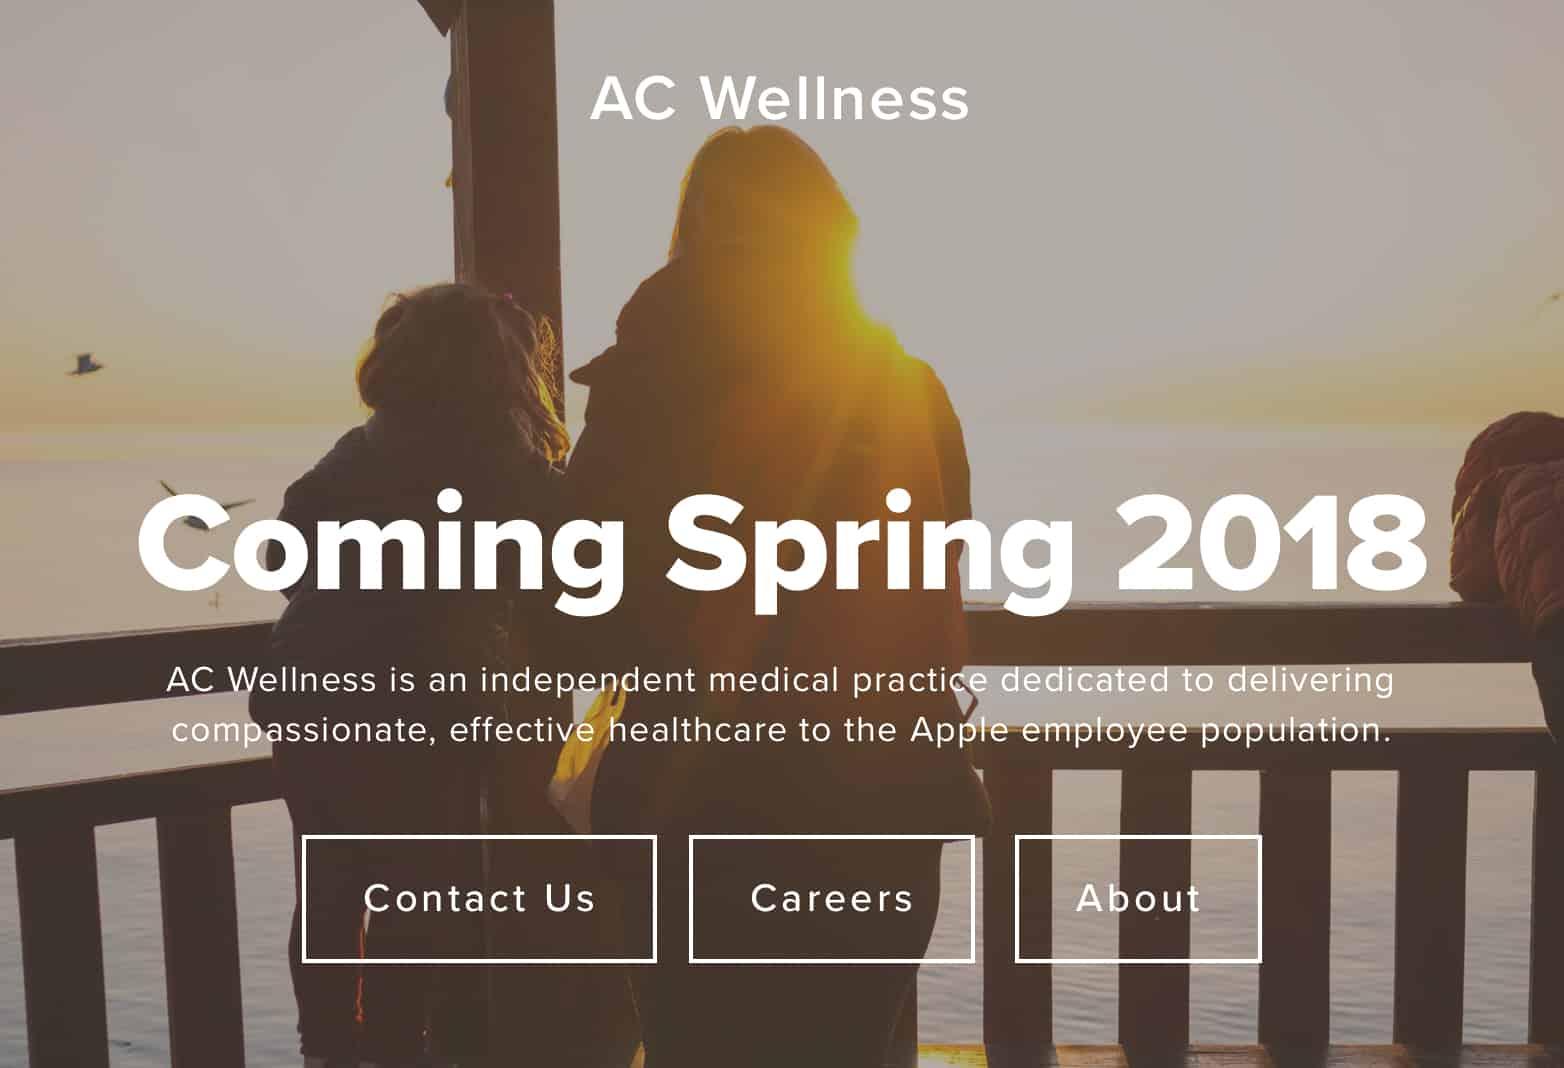 AC Wellness clinics